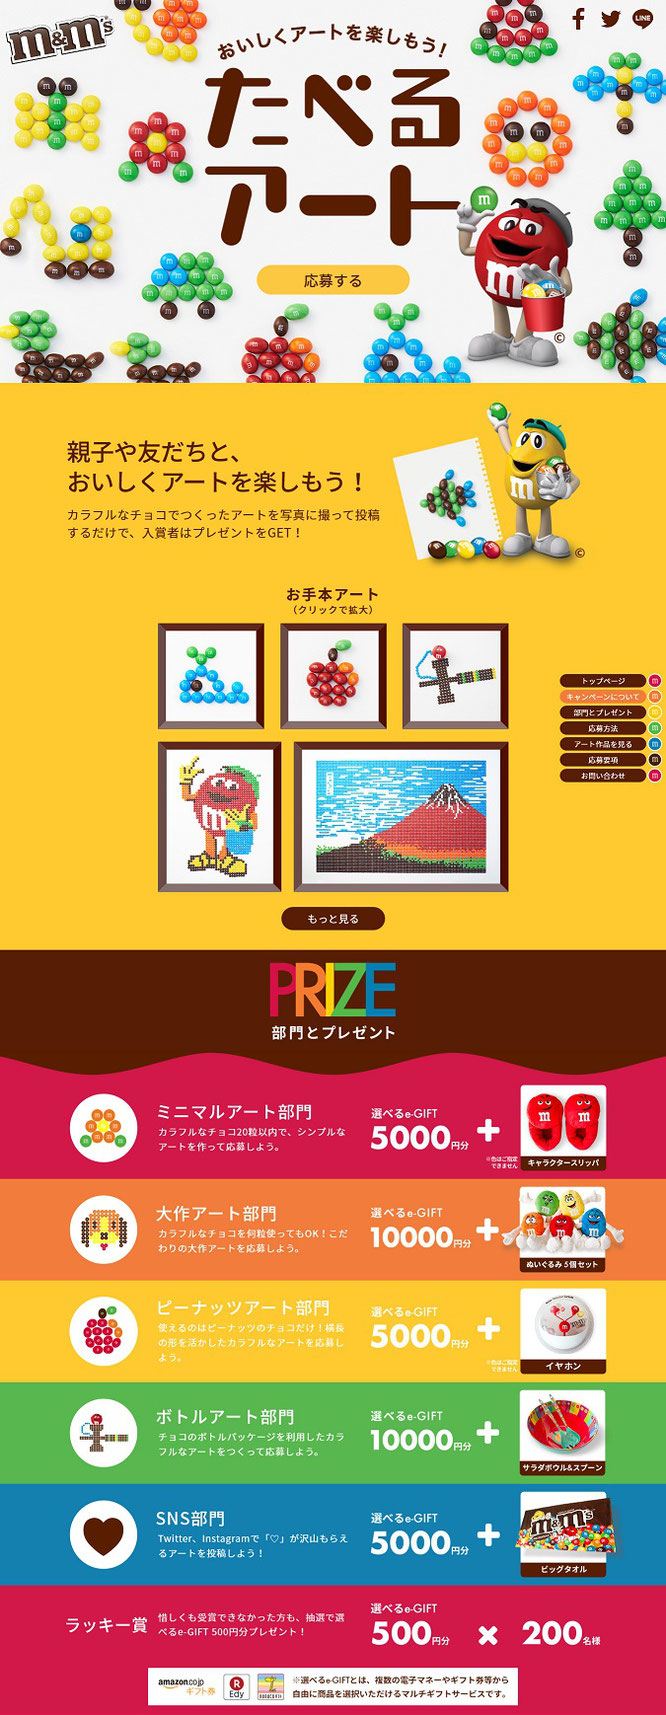 【M&M'S】M&M'S たべるアート大募集キャンペーン